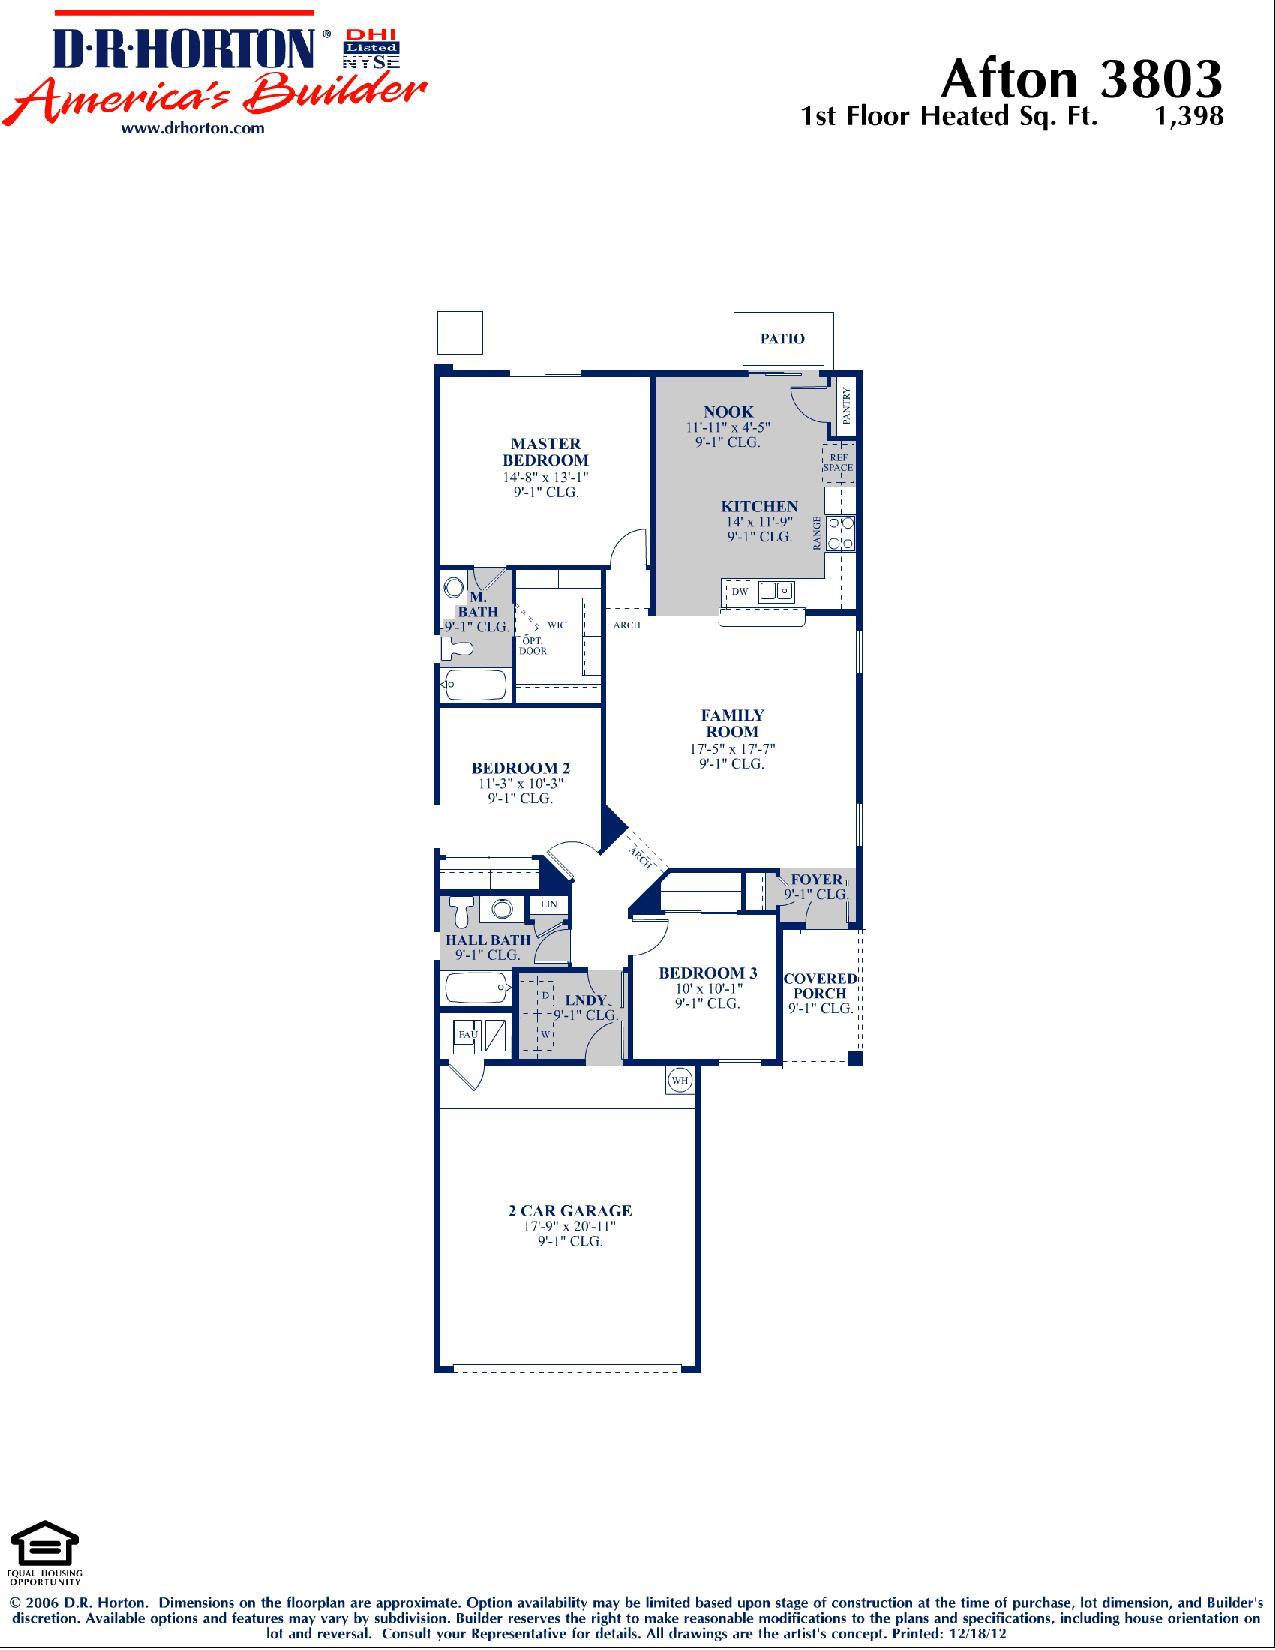 Dr Horton Afton Floor Plan